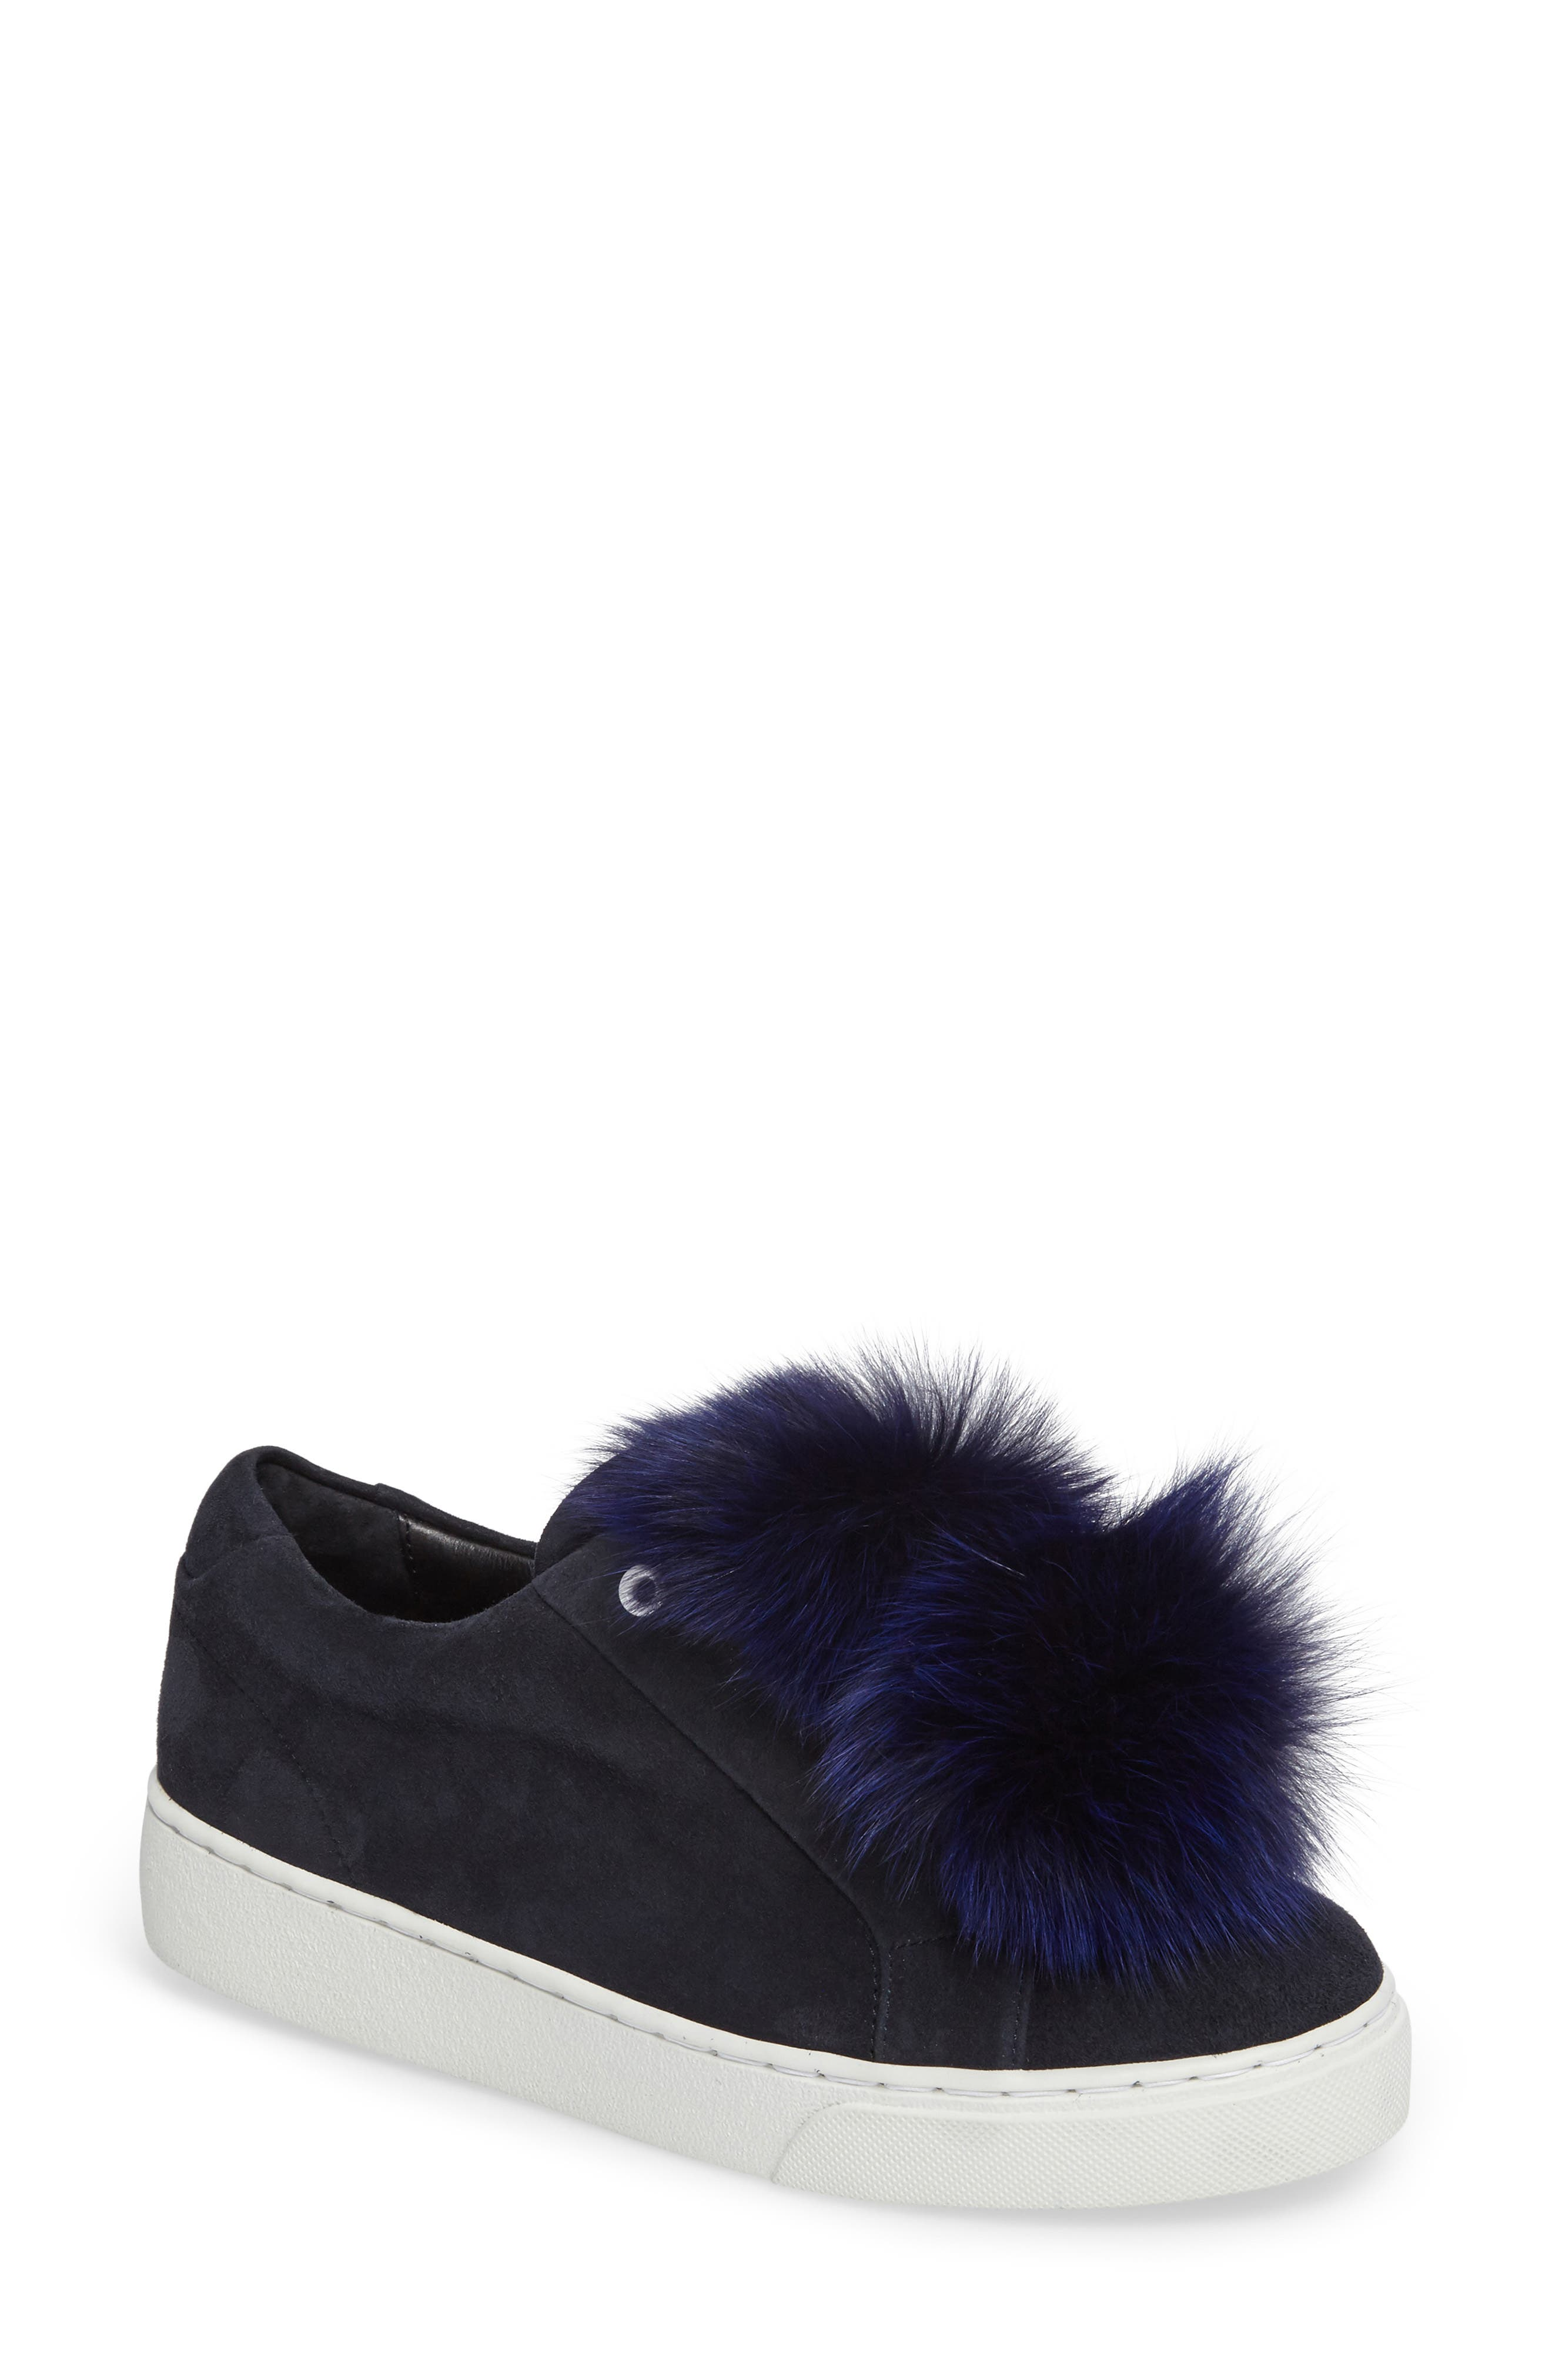 T Genuine Fox Fur Slip-On Sneaker,                             Main thumbnail 1, color,                             Navy Suede